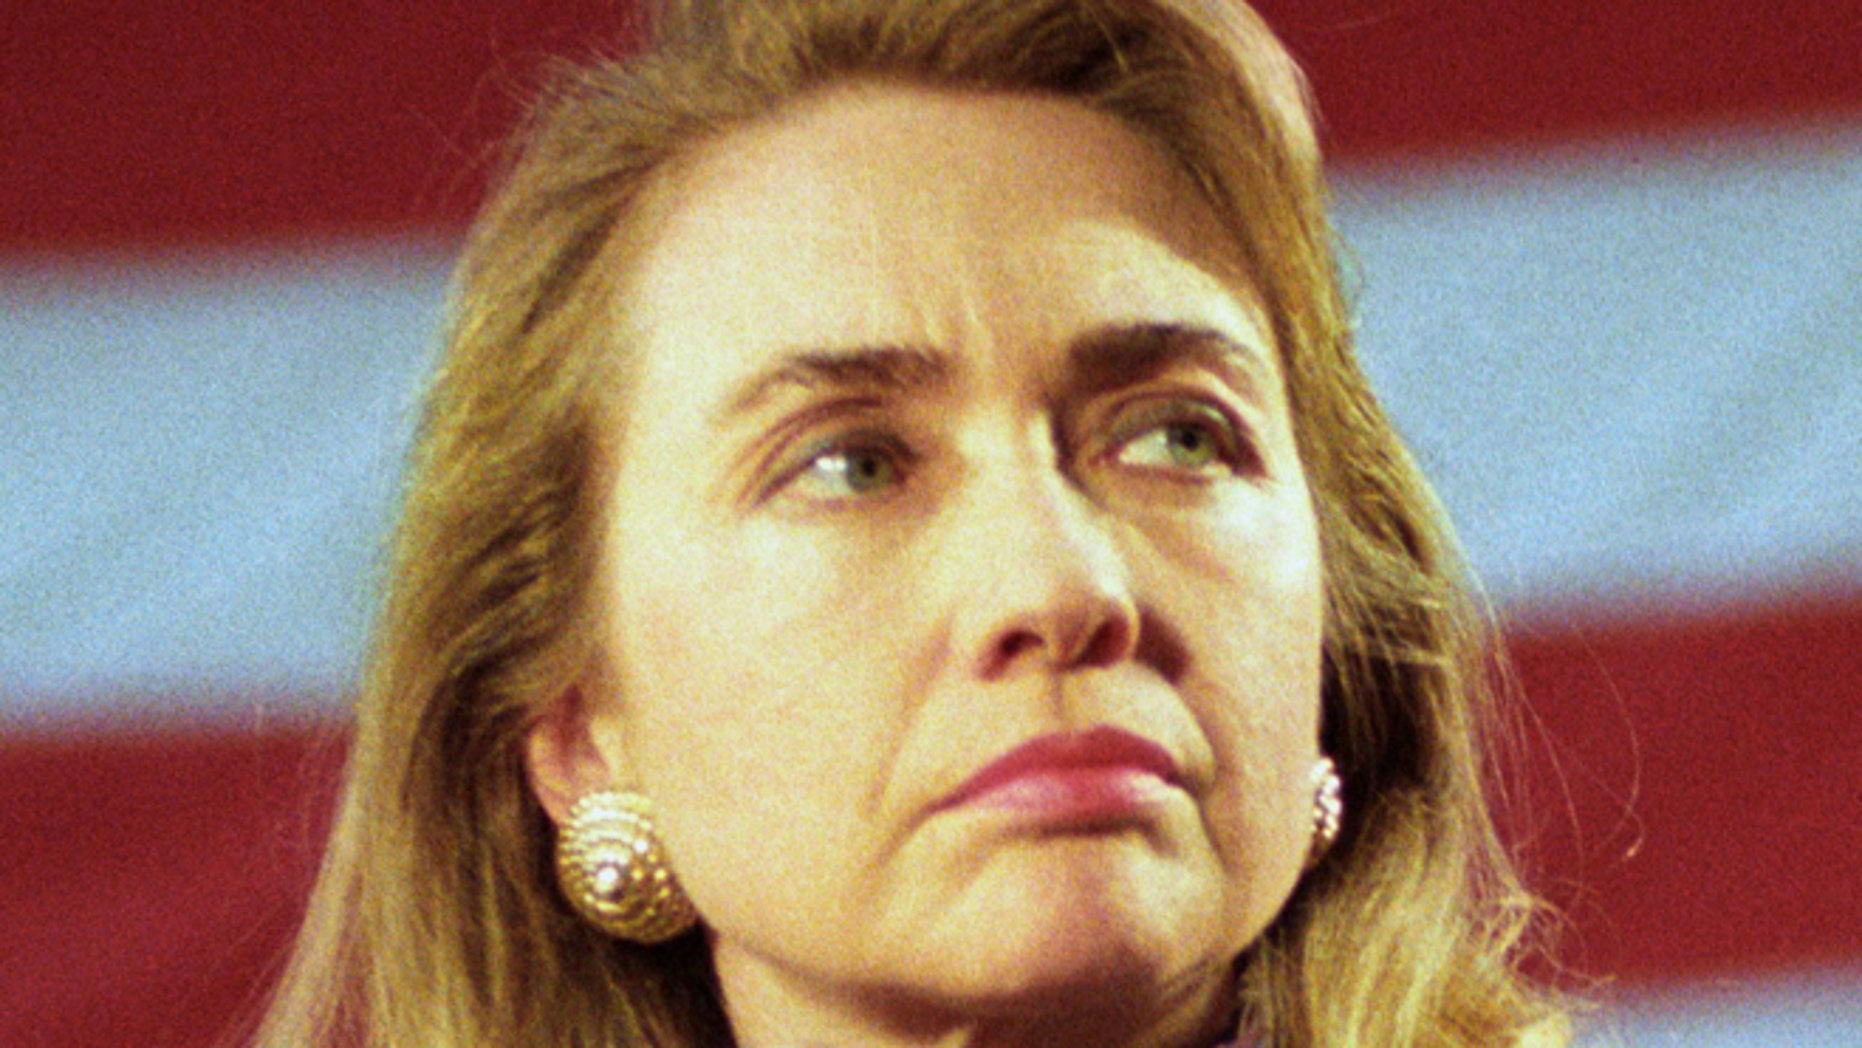 Hillary Clinton on March 16, 1992 in Wayne, MI.